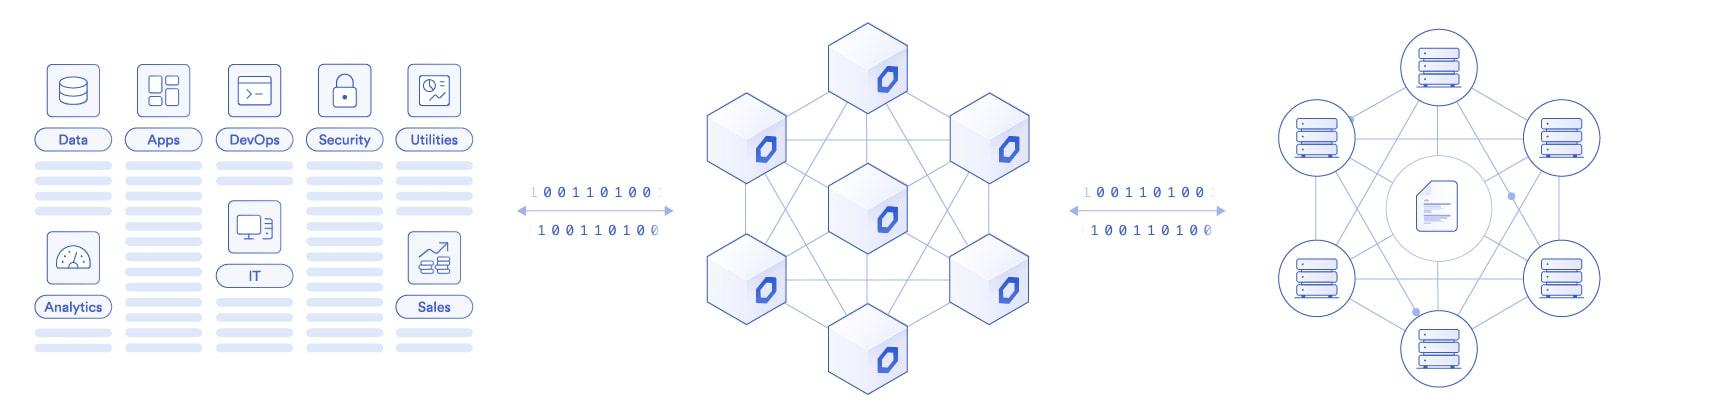 Blockchain adoption for enterprises diagram